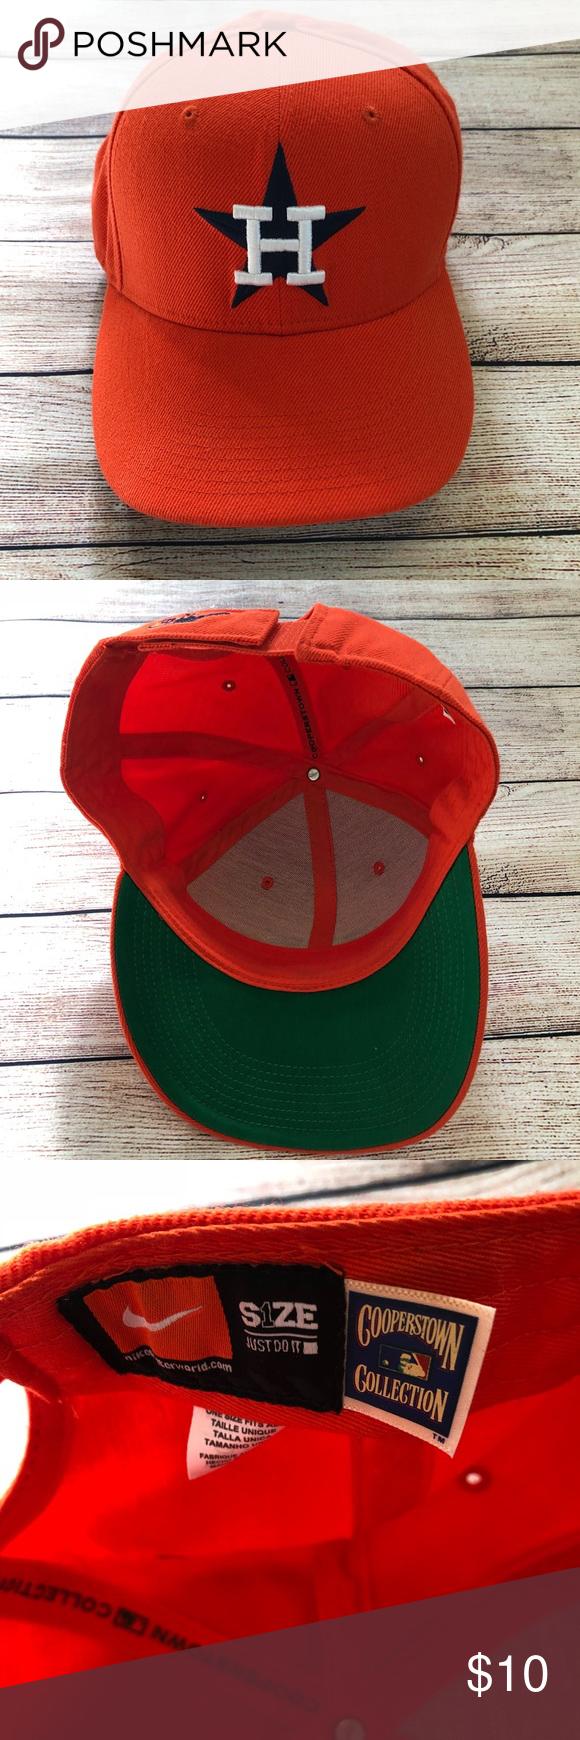 b968ea61 Nike Astros Hat Orange Adjustable Orange Nike Astros Hat. Smoke free home.  Adjustable back. See pics for details! Nike Accessories Hats